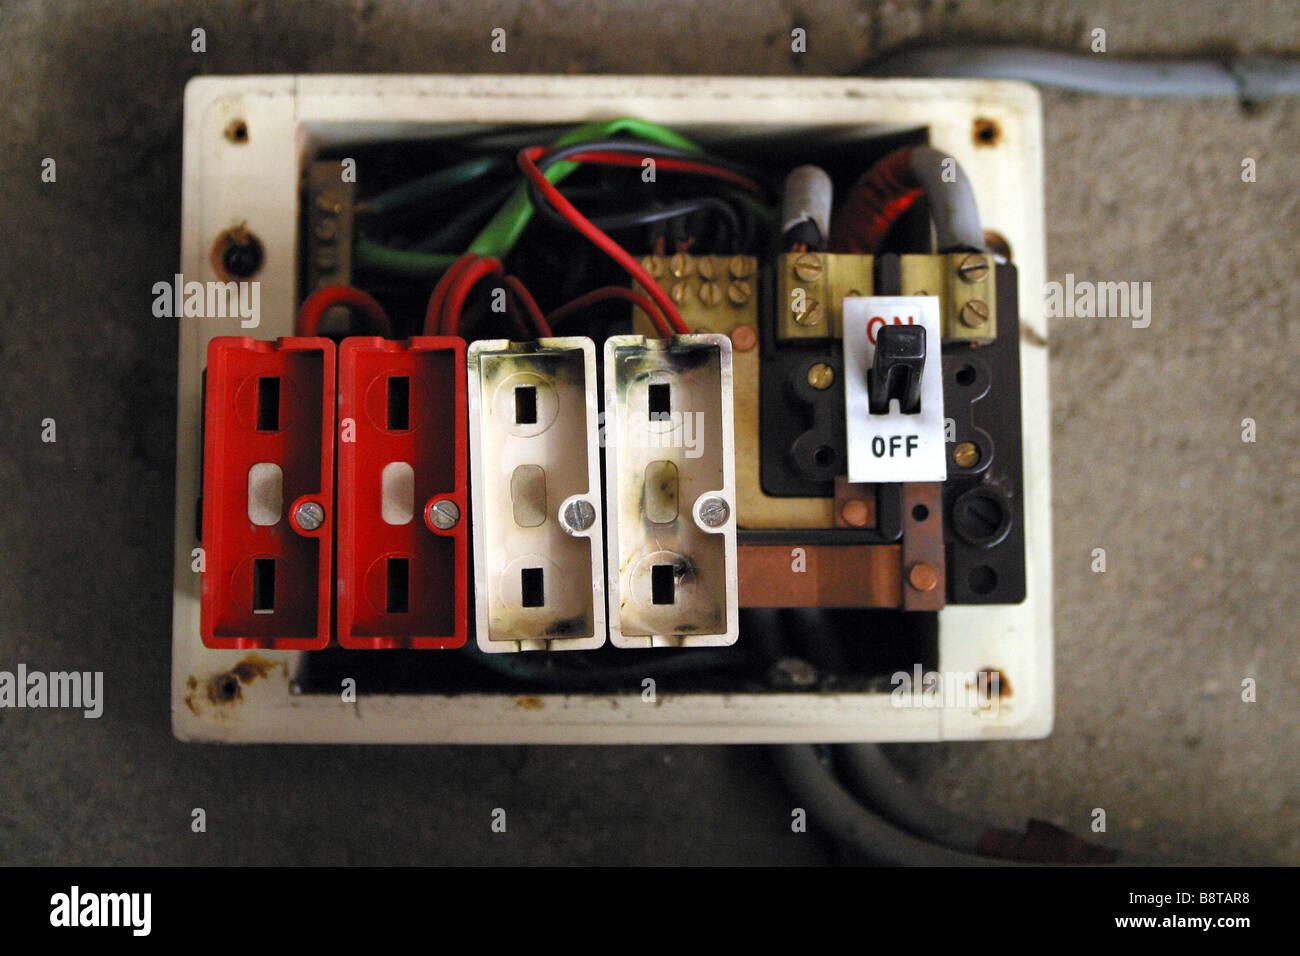 rcbo consumer unit wiring diagram 2003 lincoln ls v8 engine wrg 5461 wylex fuse box keeps tripping